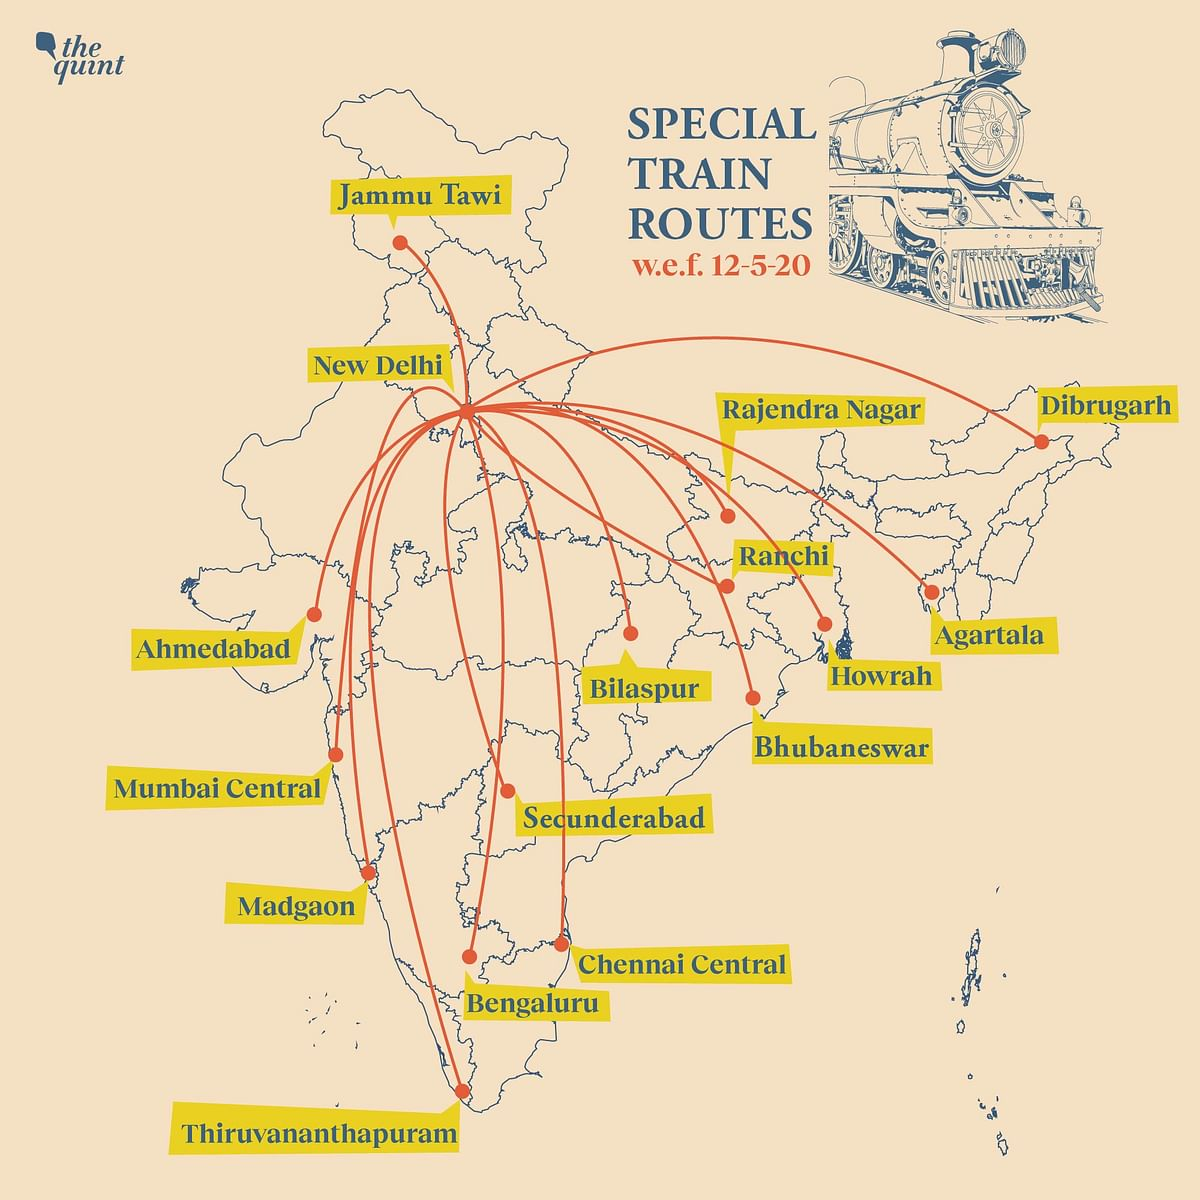 Amid  Lockdown, Railways Starts Select Trains: Here's the List